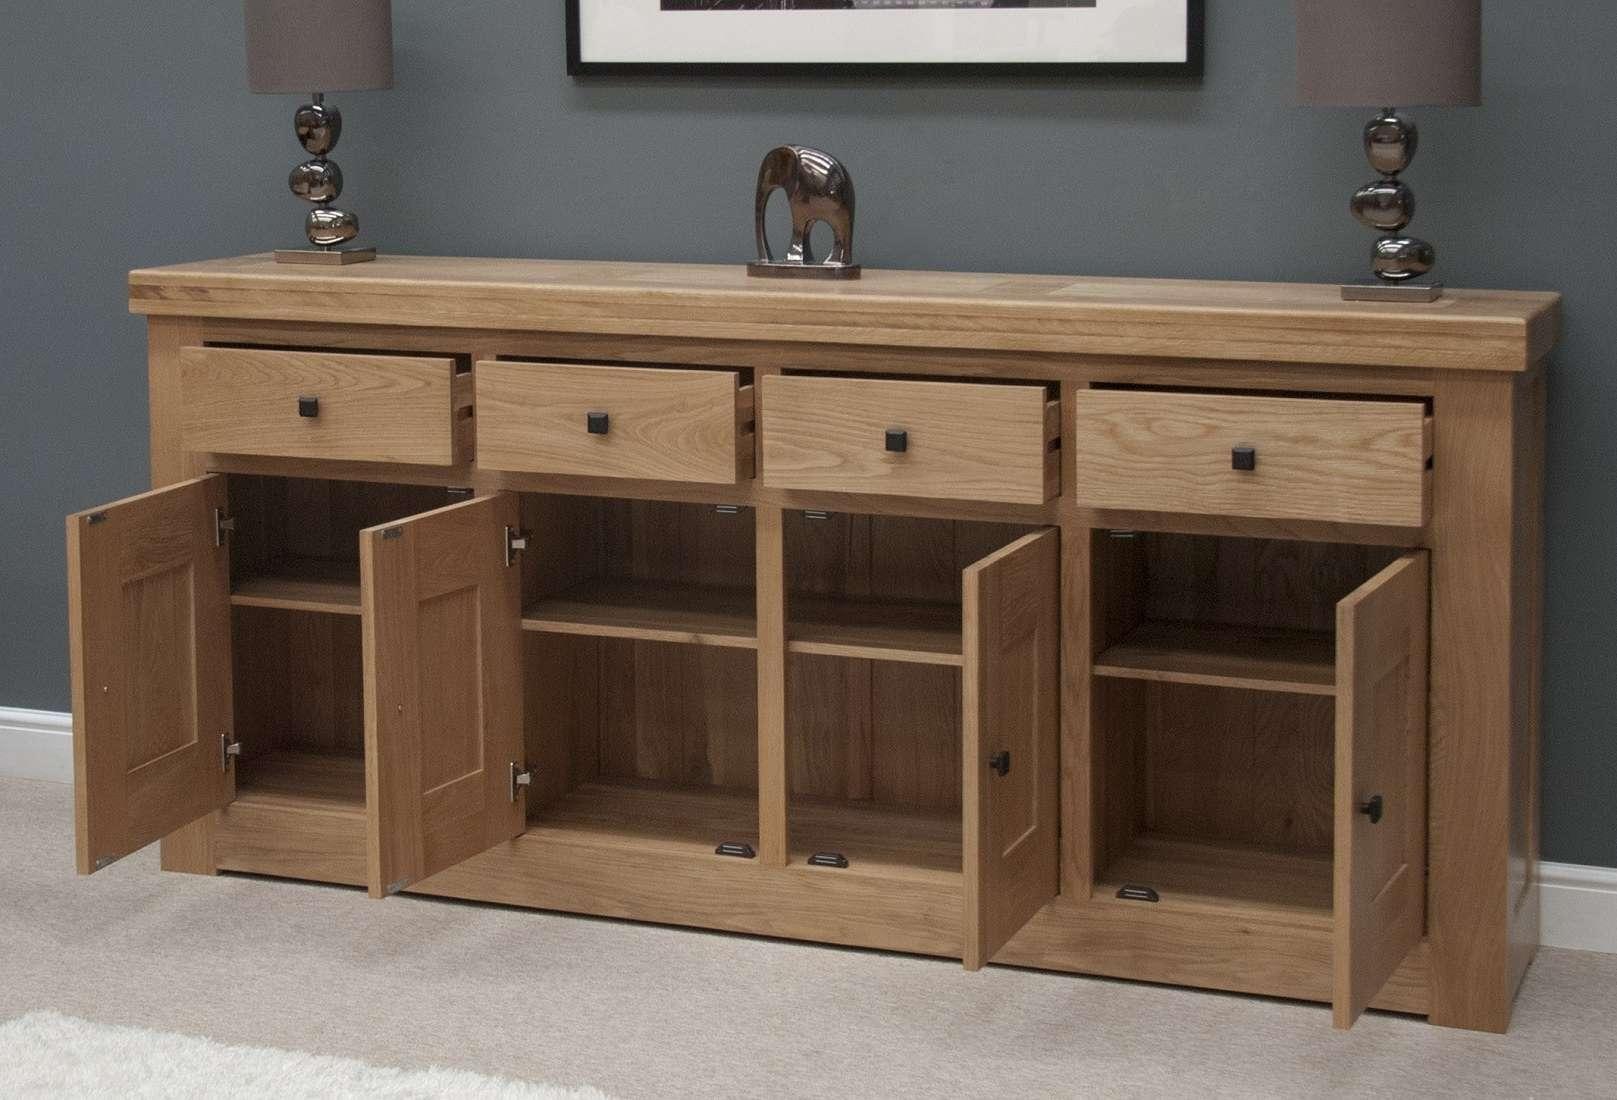 French Bordeaux Oak Extra Large 4 Door Sideboard | Oak Furniture Uk Within Oak Sideboards (View 15 of 20)